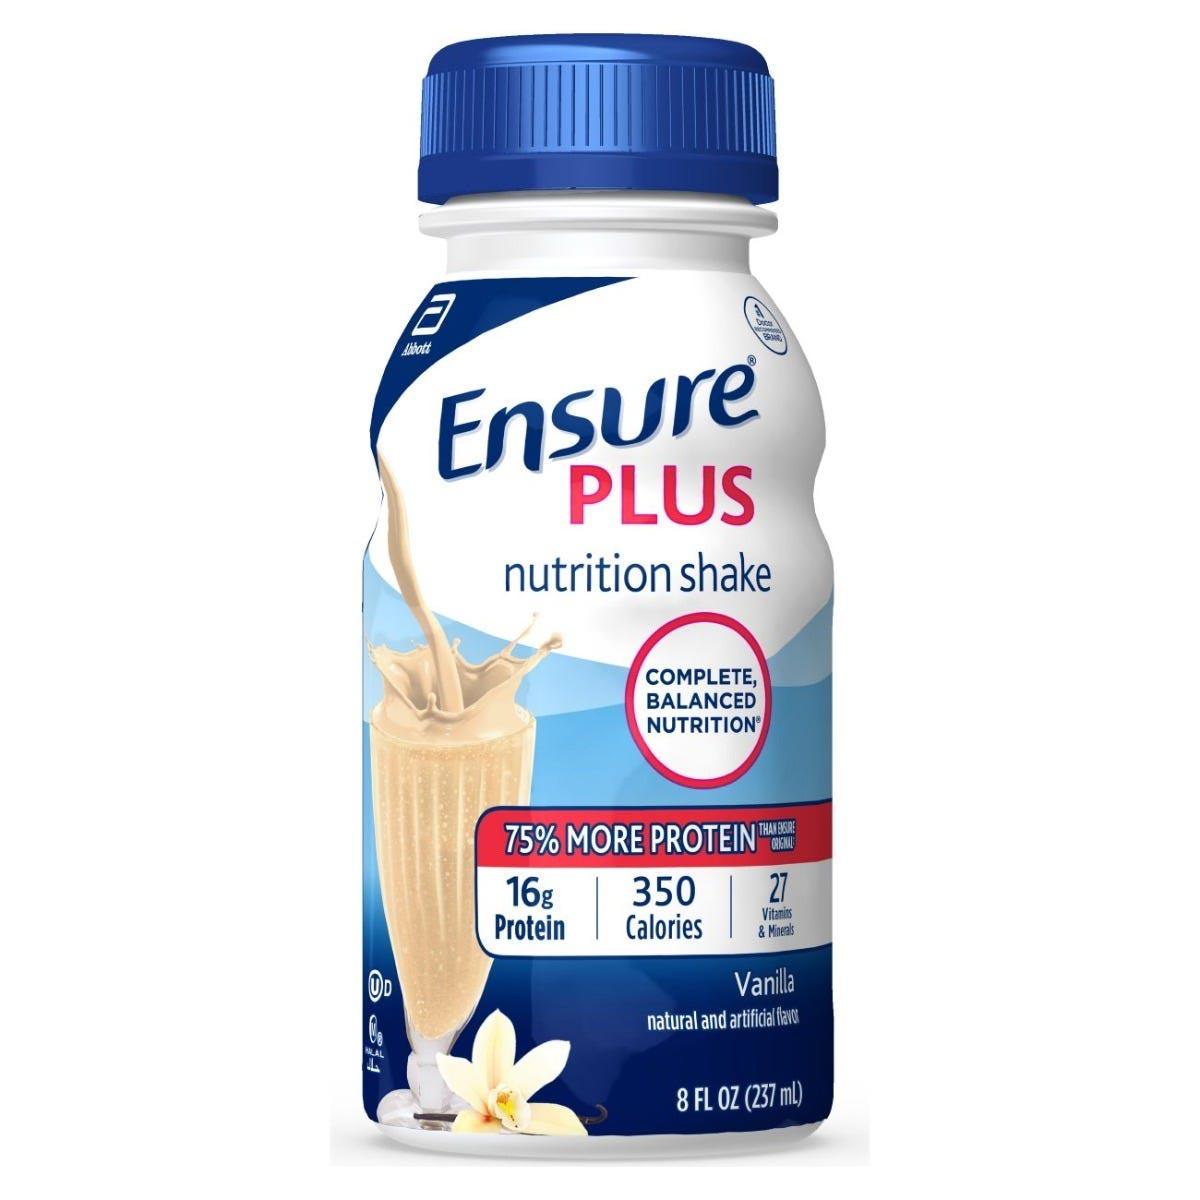 Ensure Plus Ready to Use Nutritional Shake